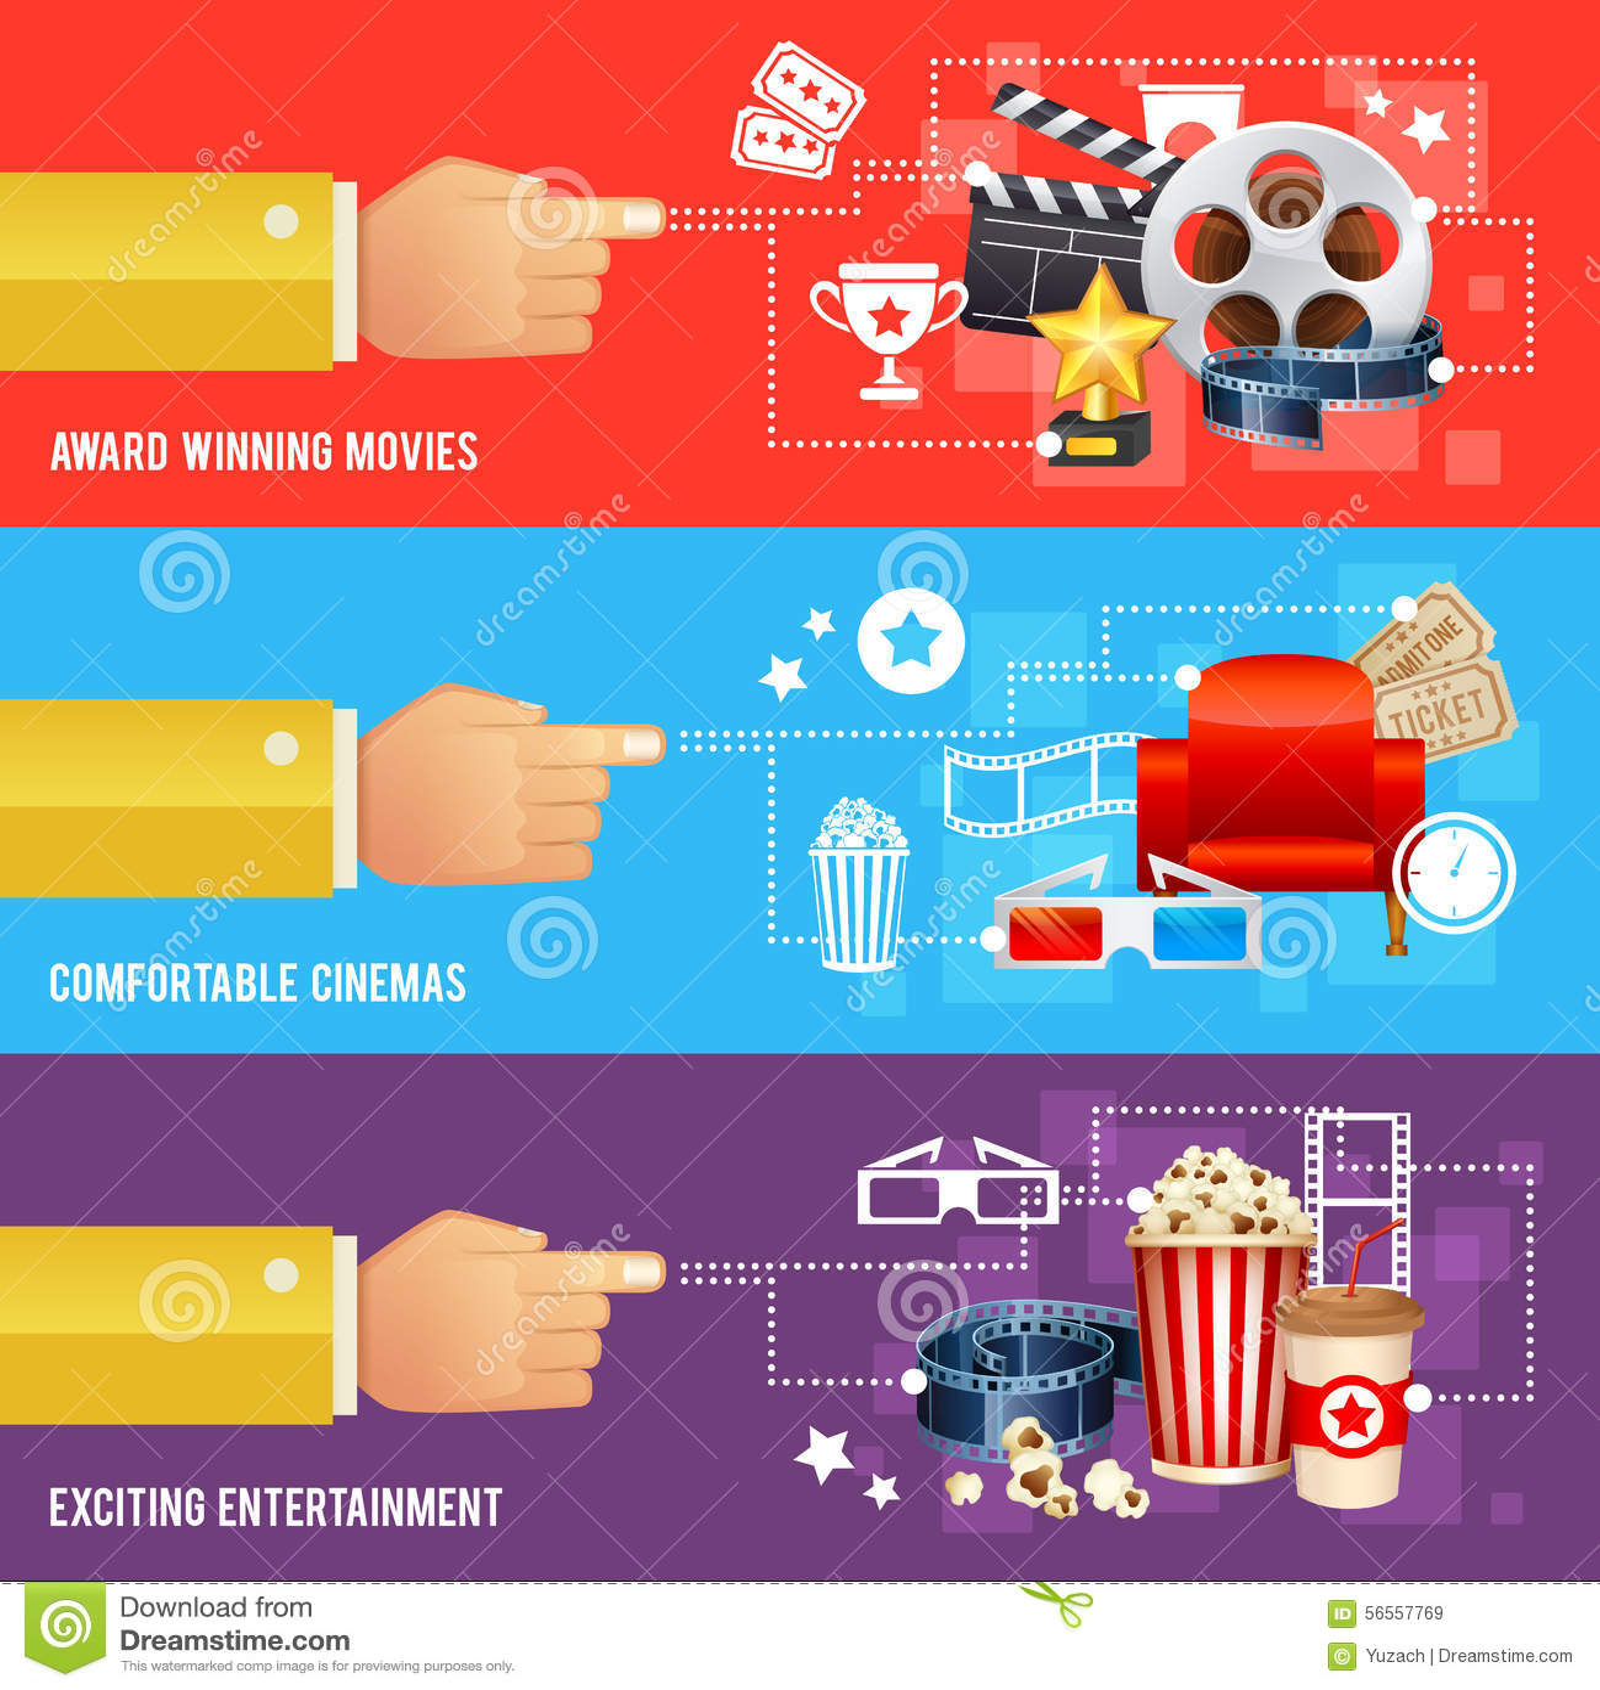 Download Ρεαλιστικό πρότυπο αφισών κινηματογράφων κινηματογράφων Στοκ Εικόνα - εικόνα από ταινία, μάρκετινγκ: 56557769